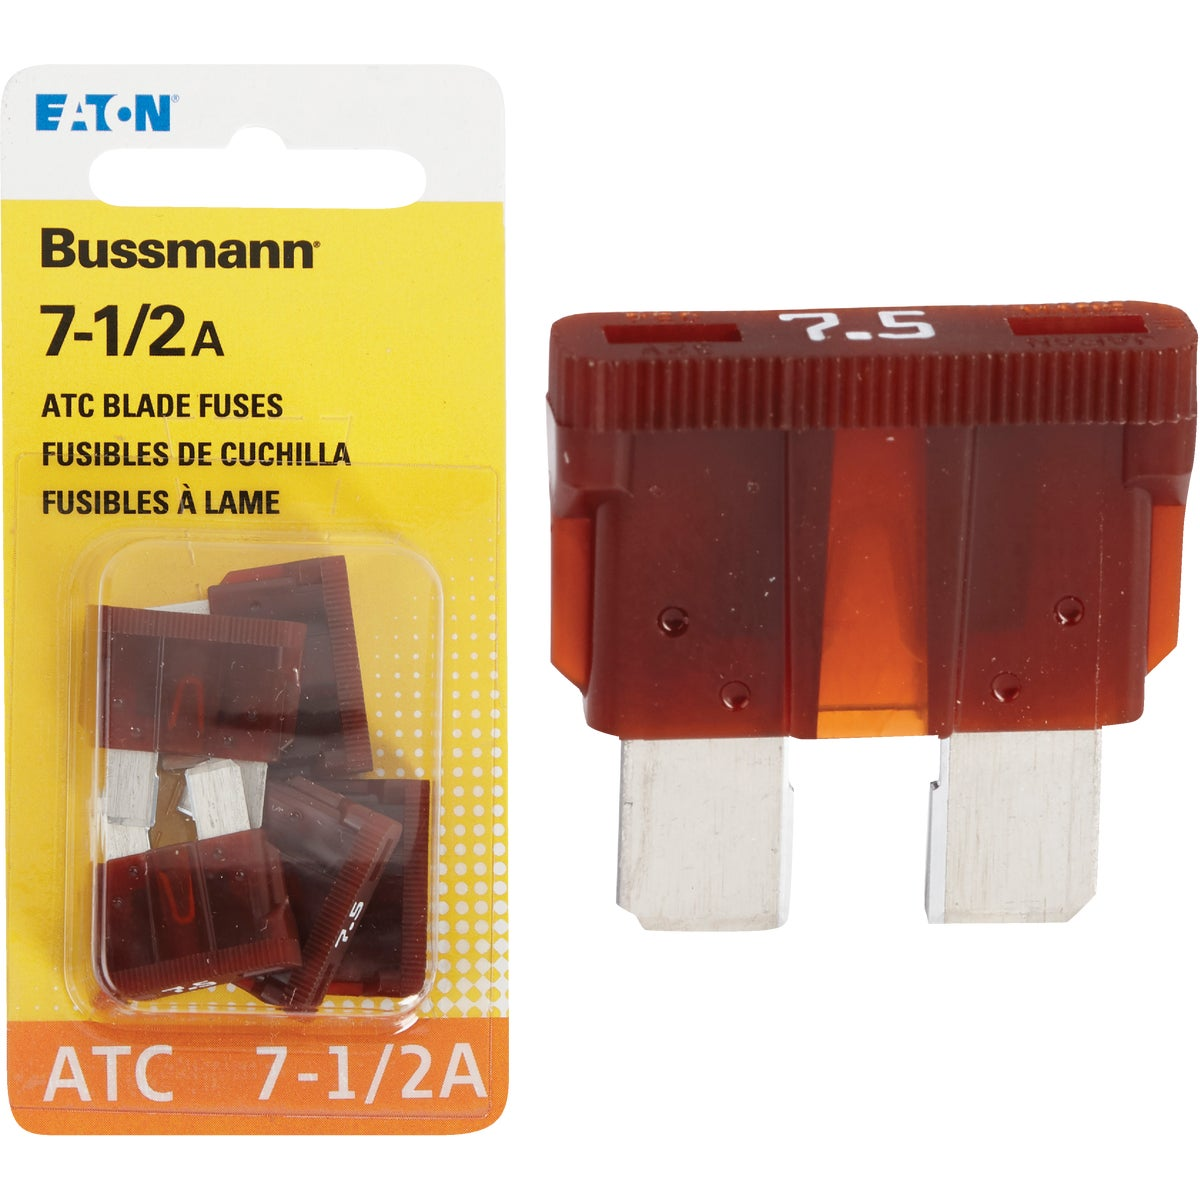 7-1/2AMP FUSE - BP/ATC-7-1/2-RP by Bussmann Cooper